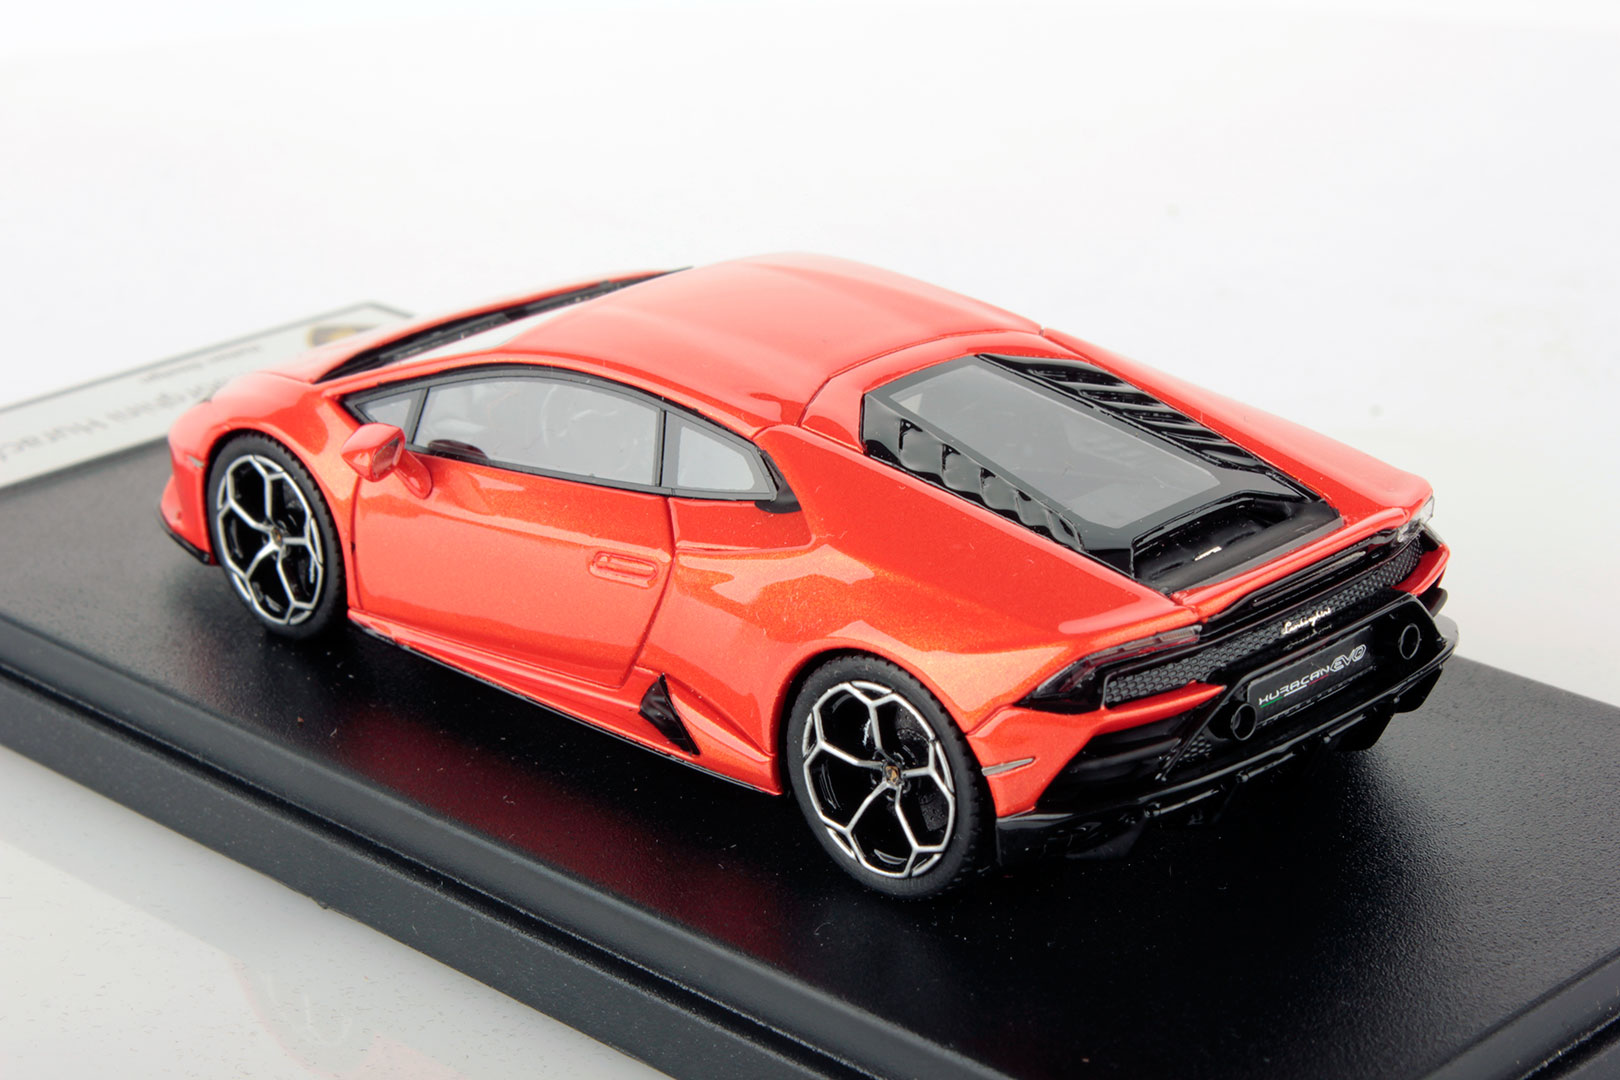 Lamborghini Huracan Evo miniature (5)